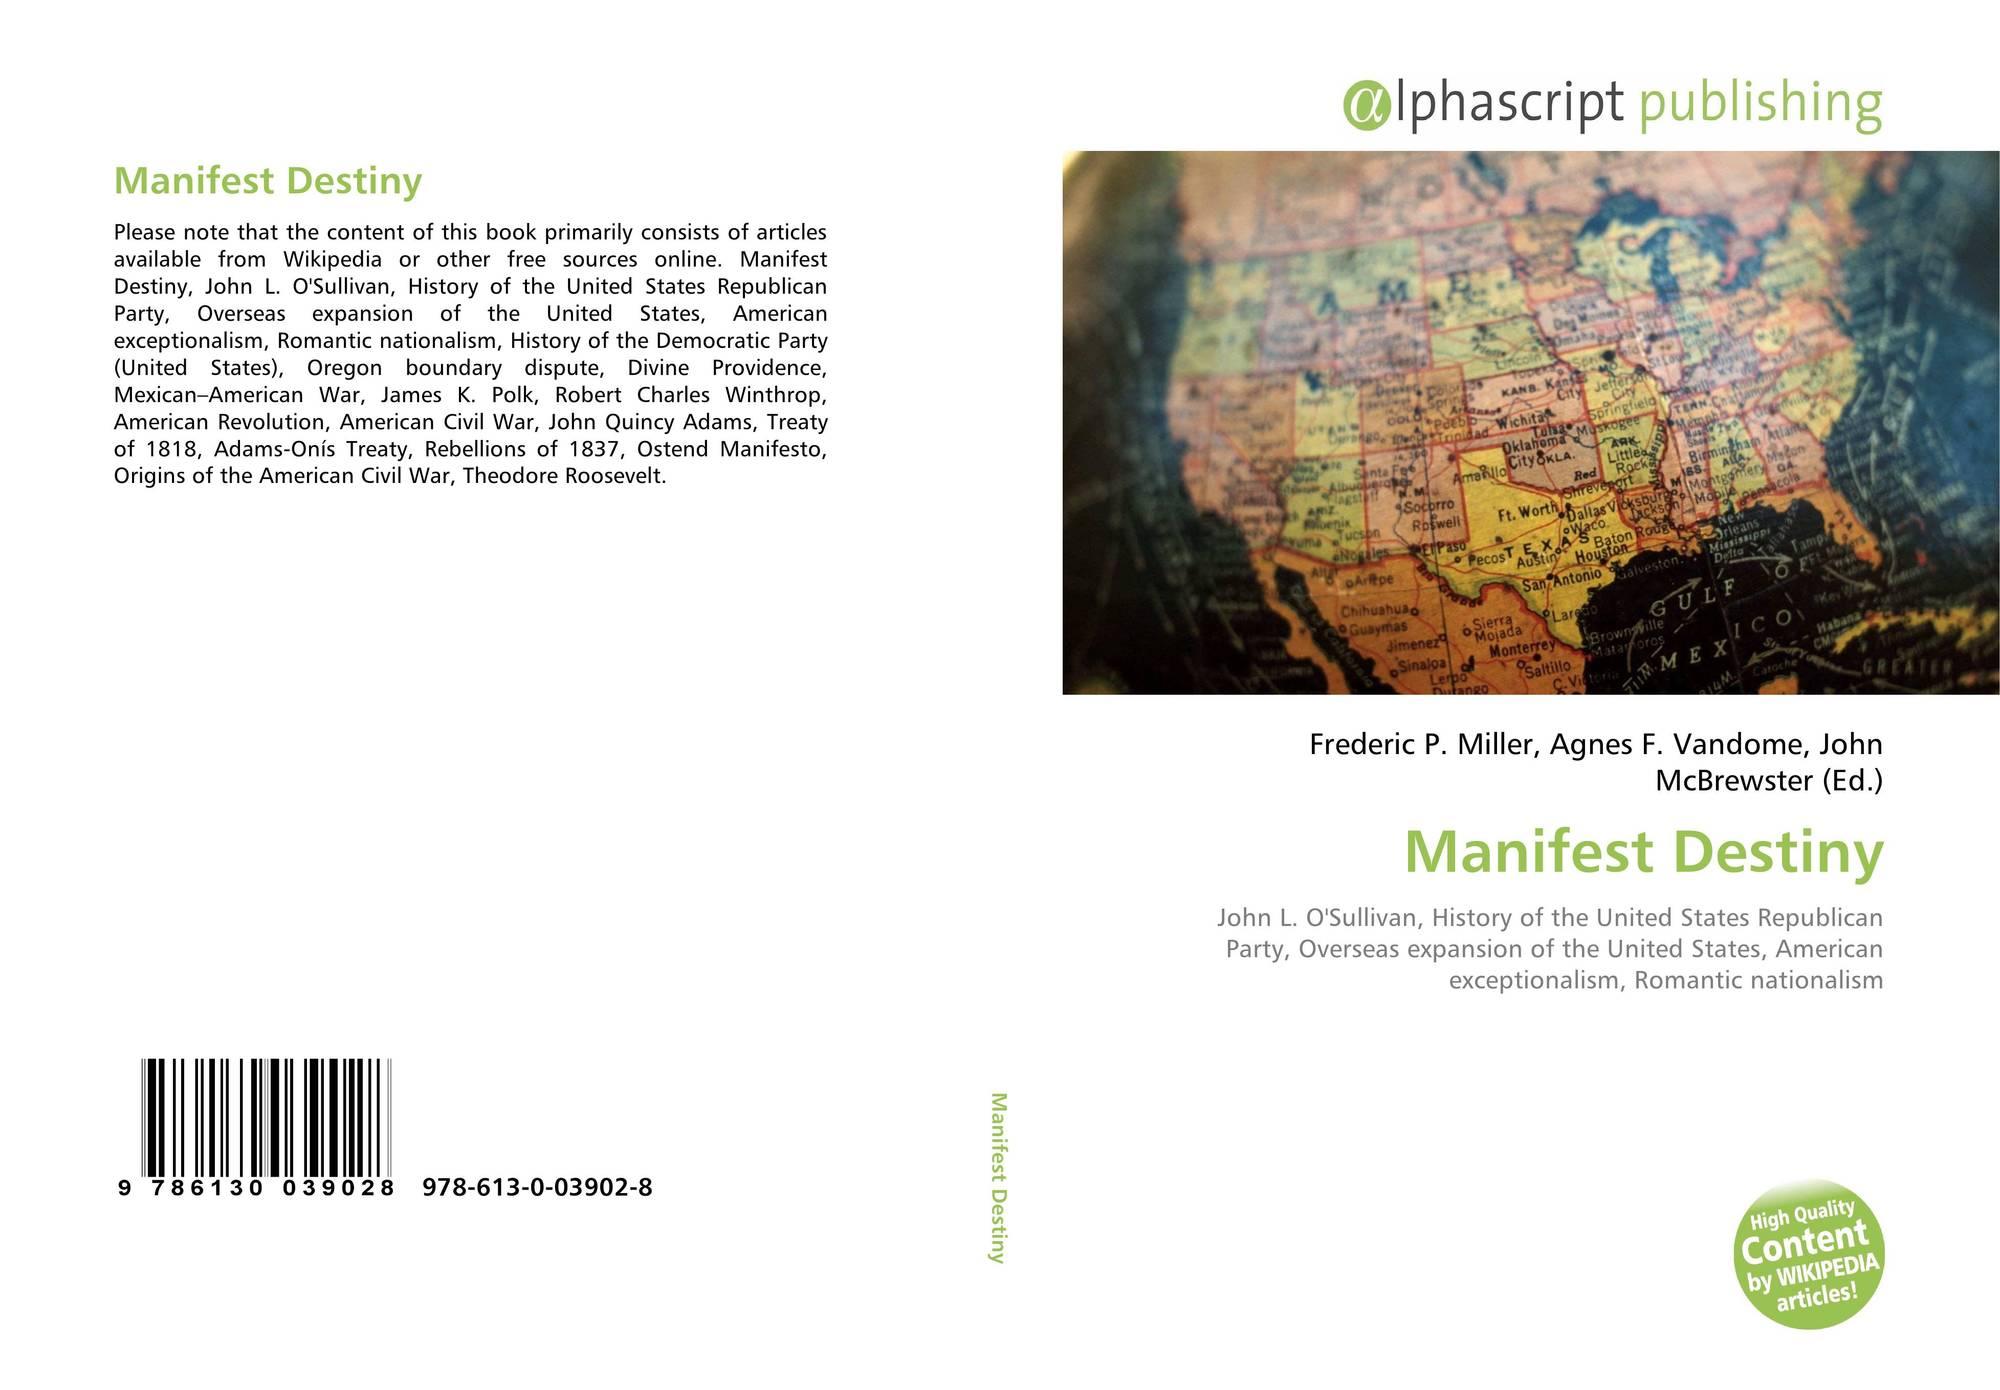 john o sullivan manifest destiny article